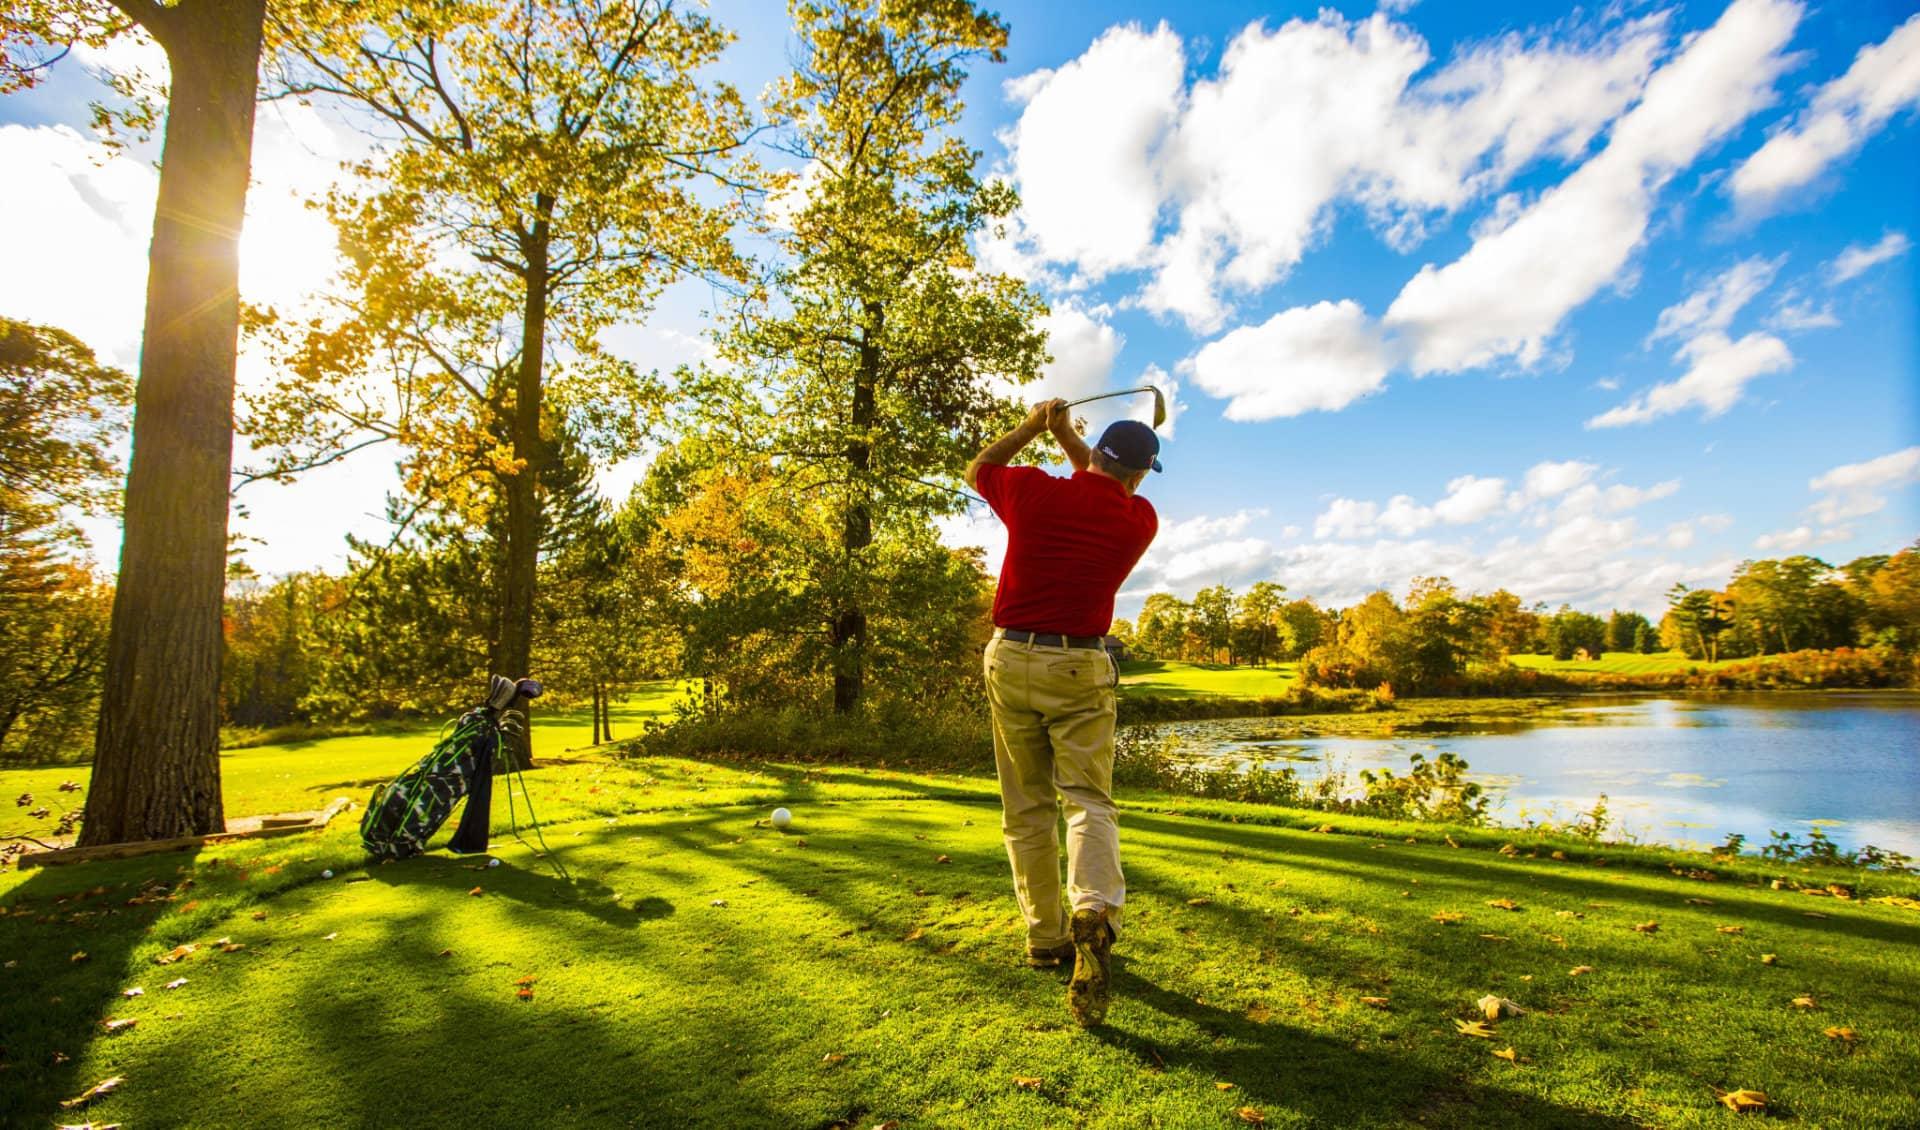 Golfing at Ruttger's Bay Lake